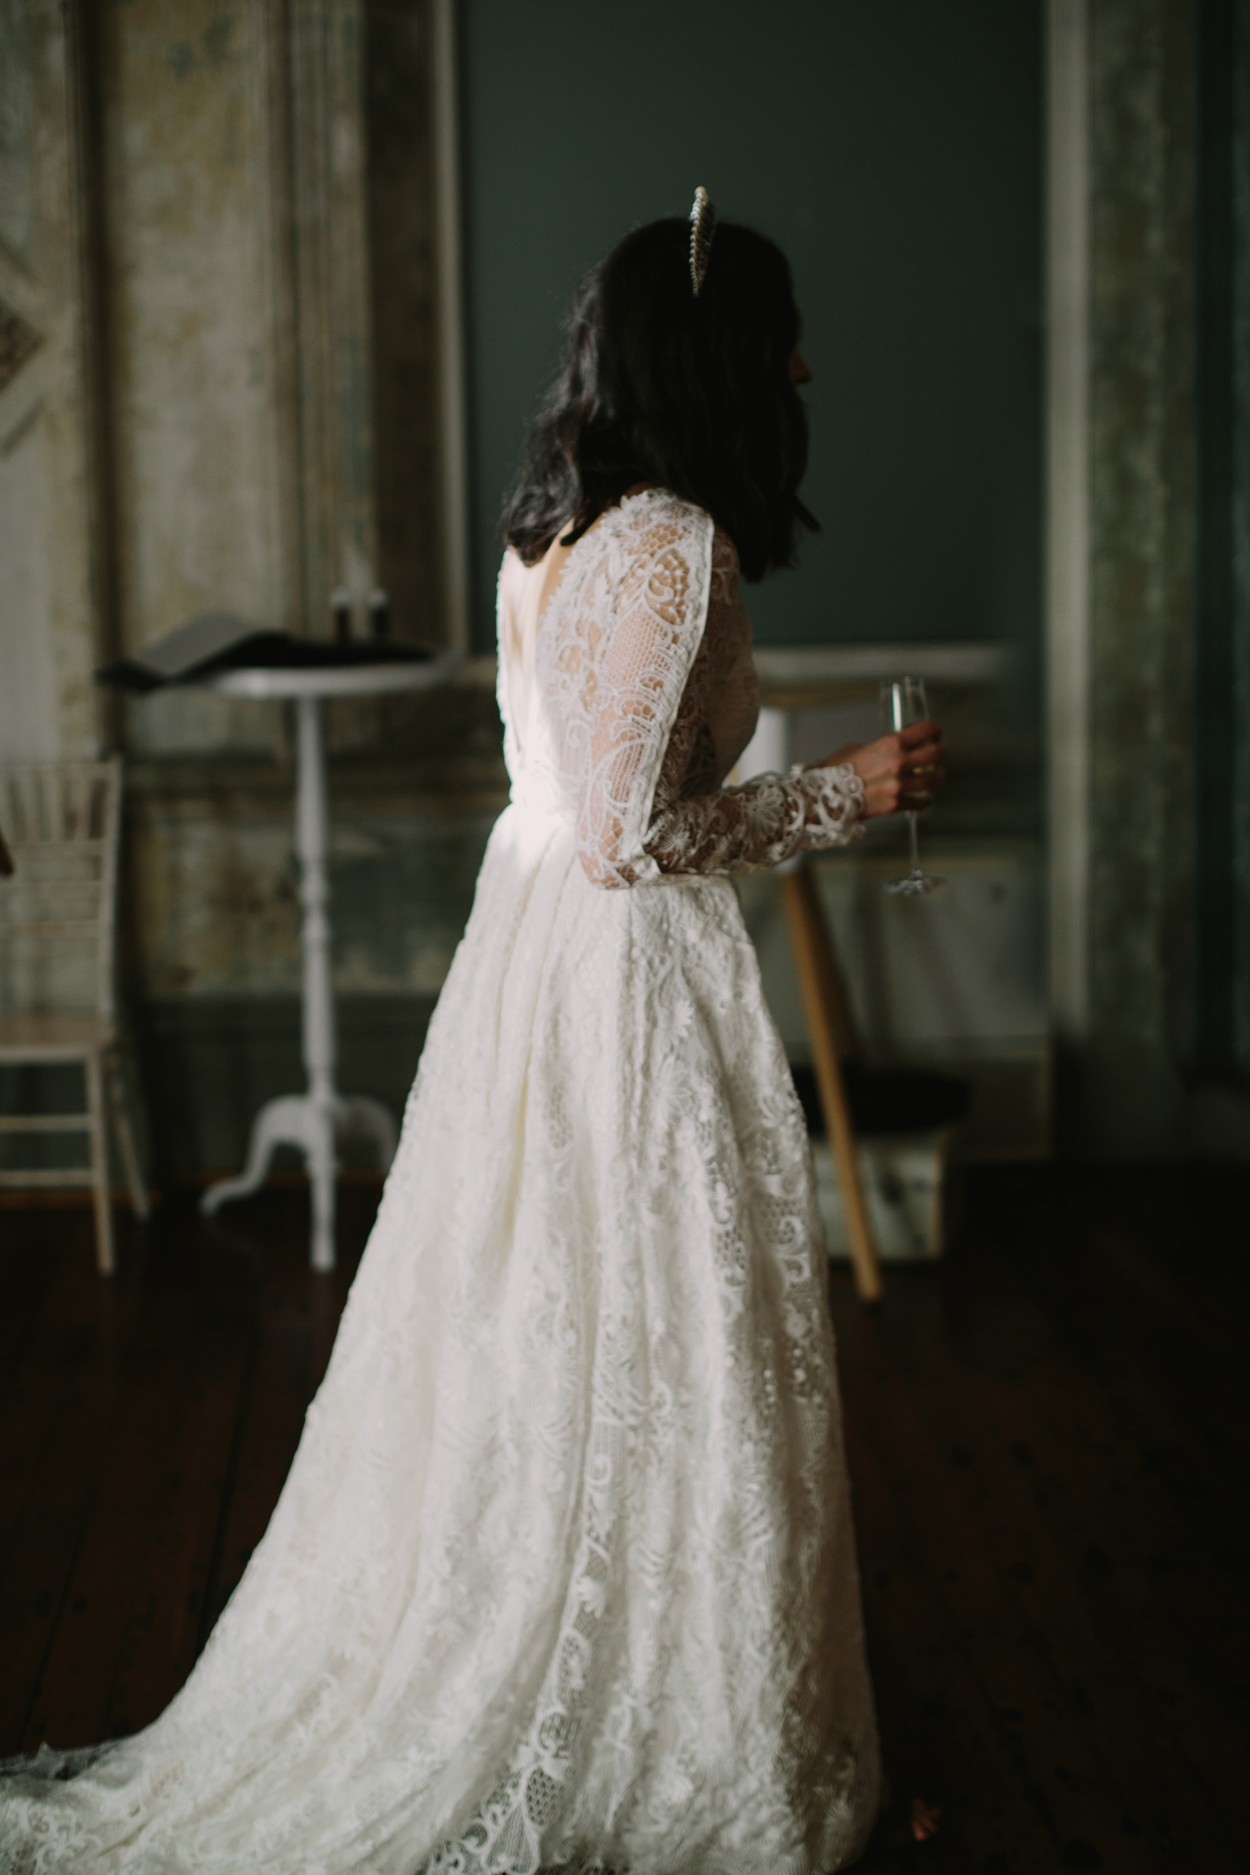 I-Got-You-Babe-Weddings-The-107George-Ballroom-St-Kilda-Wedding-Amy-Abhi.jpg